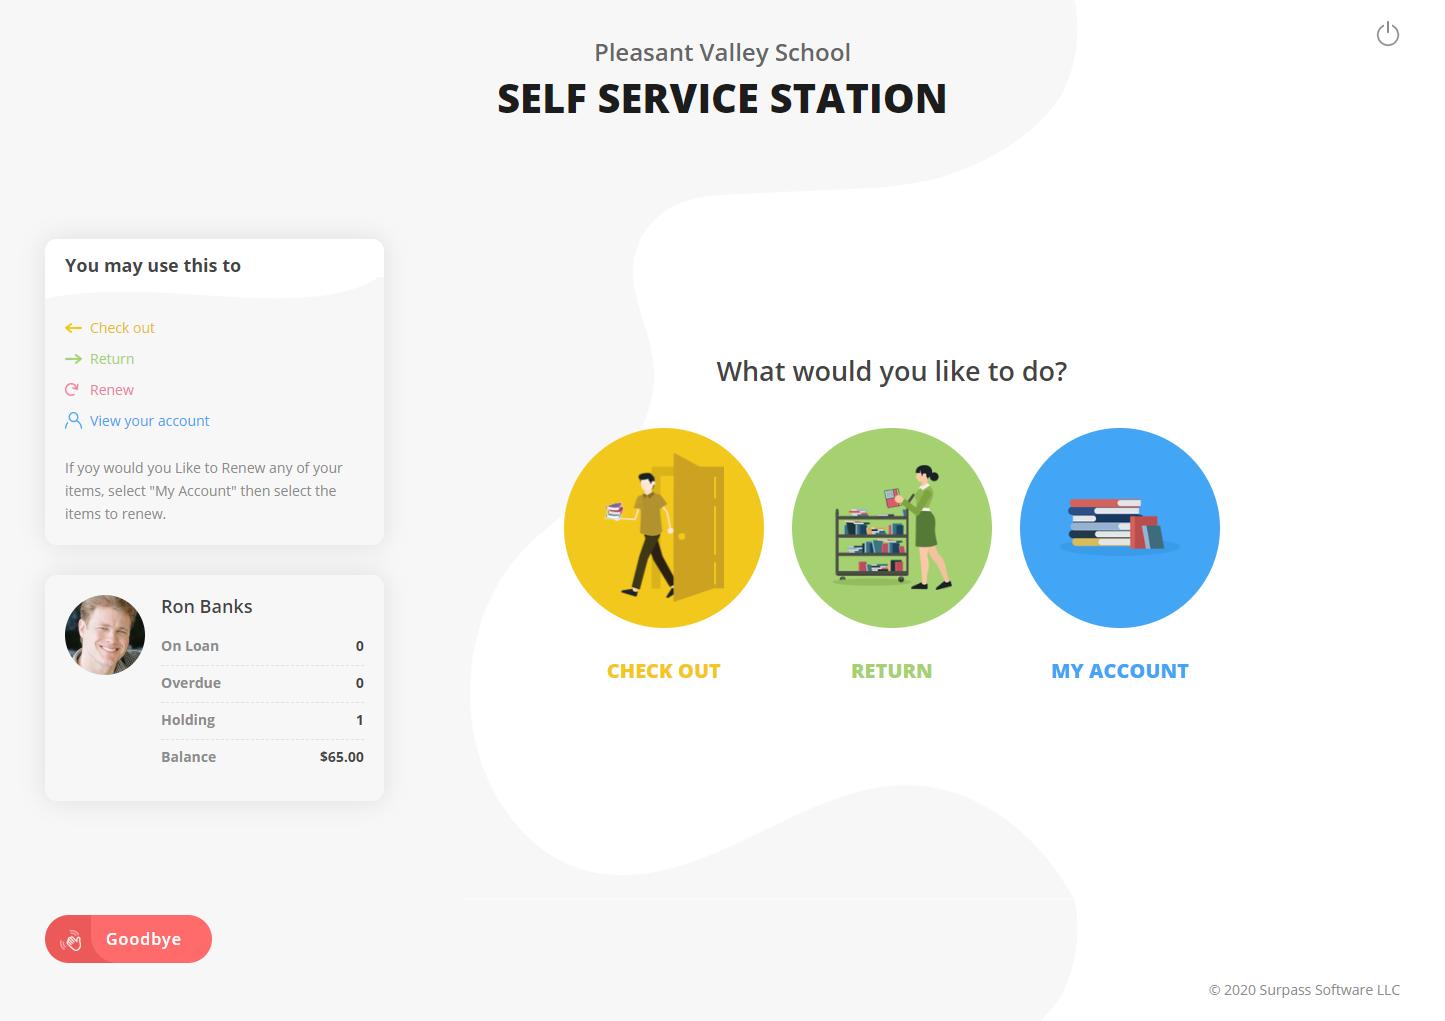 Surpass self-service station